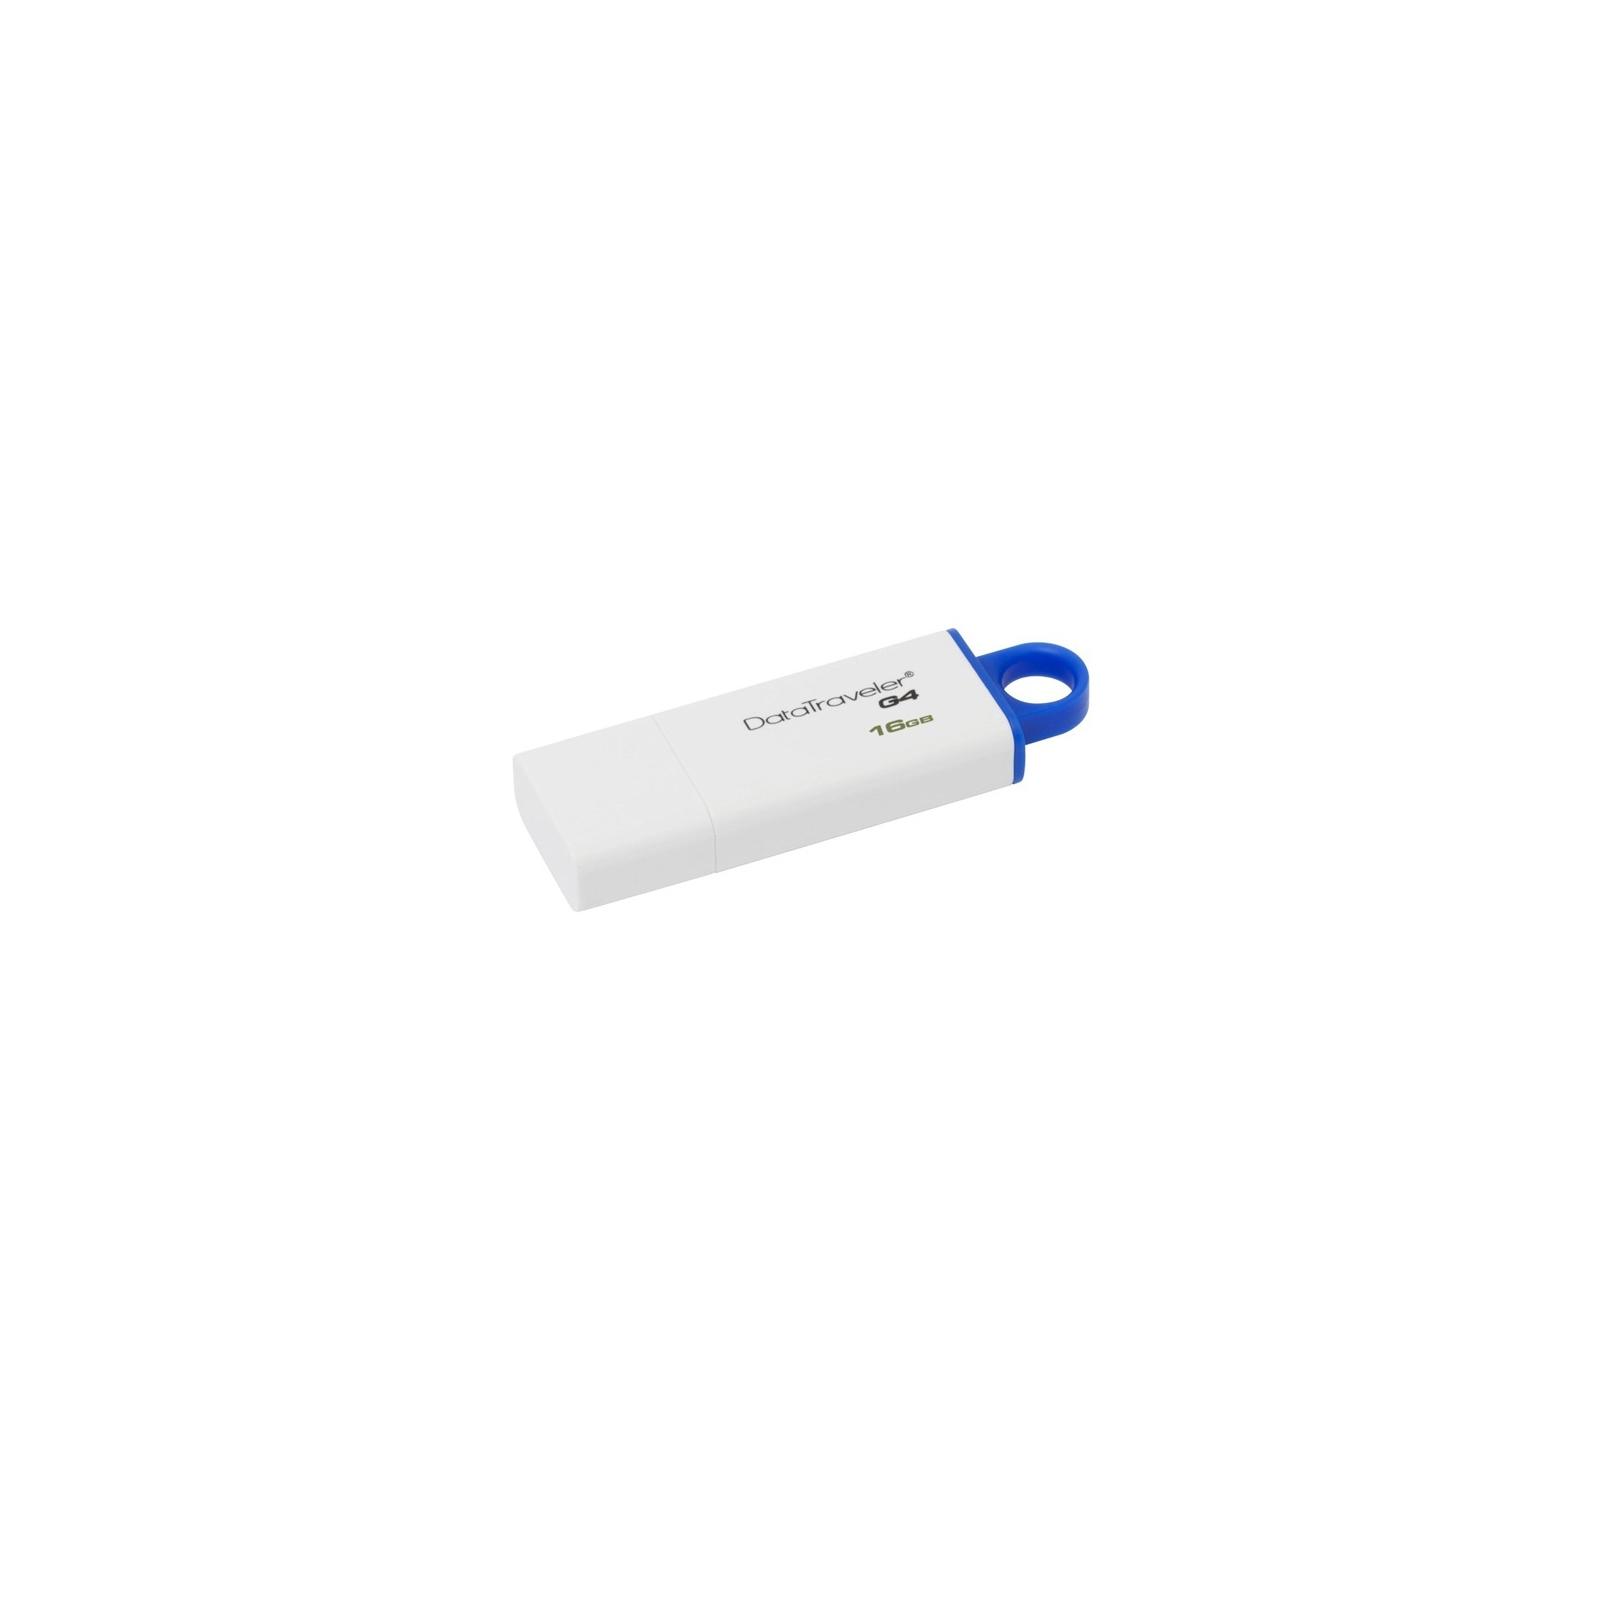 USB флеш накопитель Kingston 128Gb DataTraveler Generation 4 (DTIG4/128GB) изображение 2